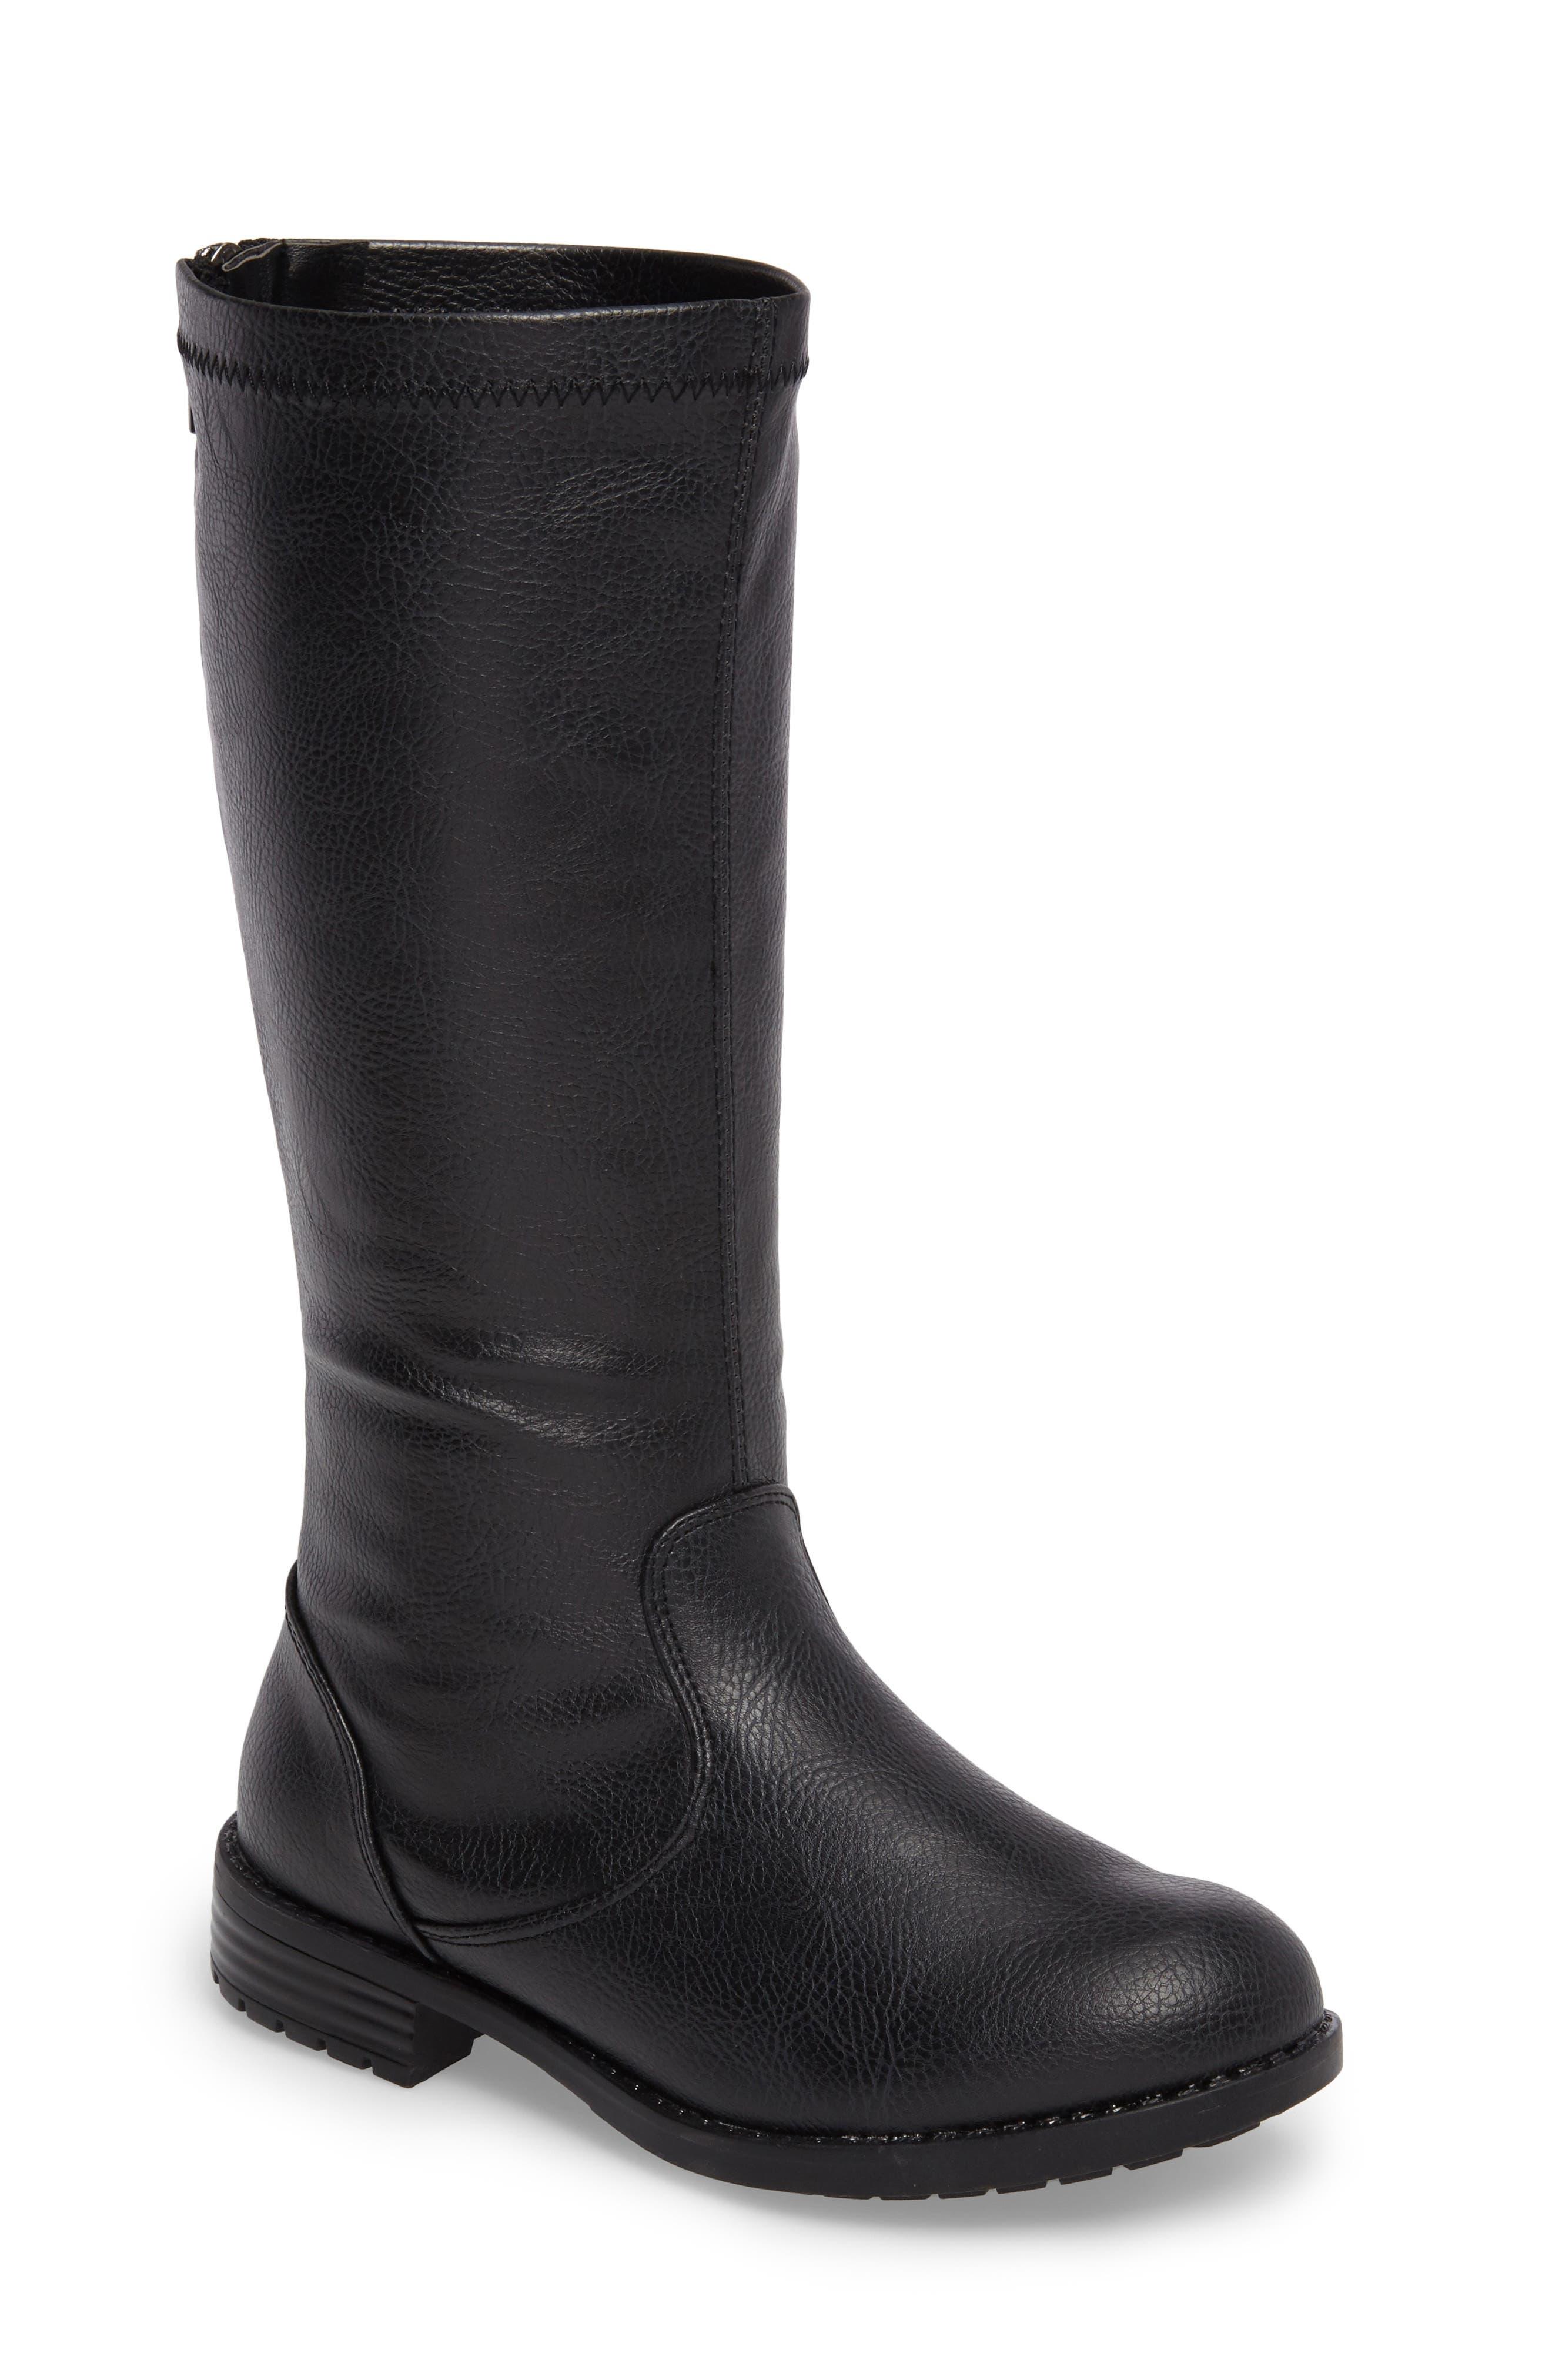 Autumn Stretch Boot,                             Main thumbnail 1, color,                             Black Faux Leather